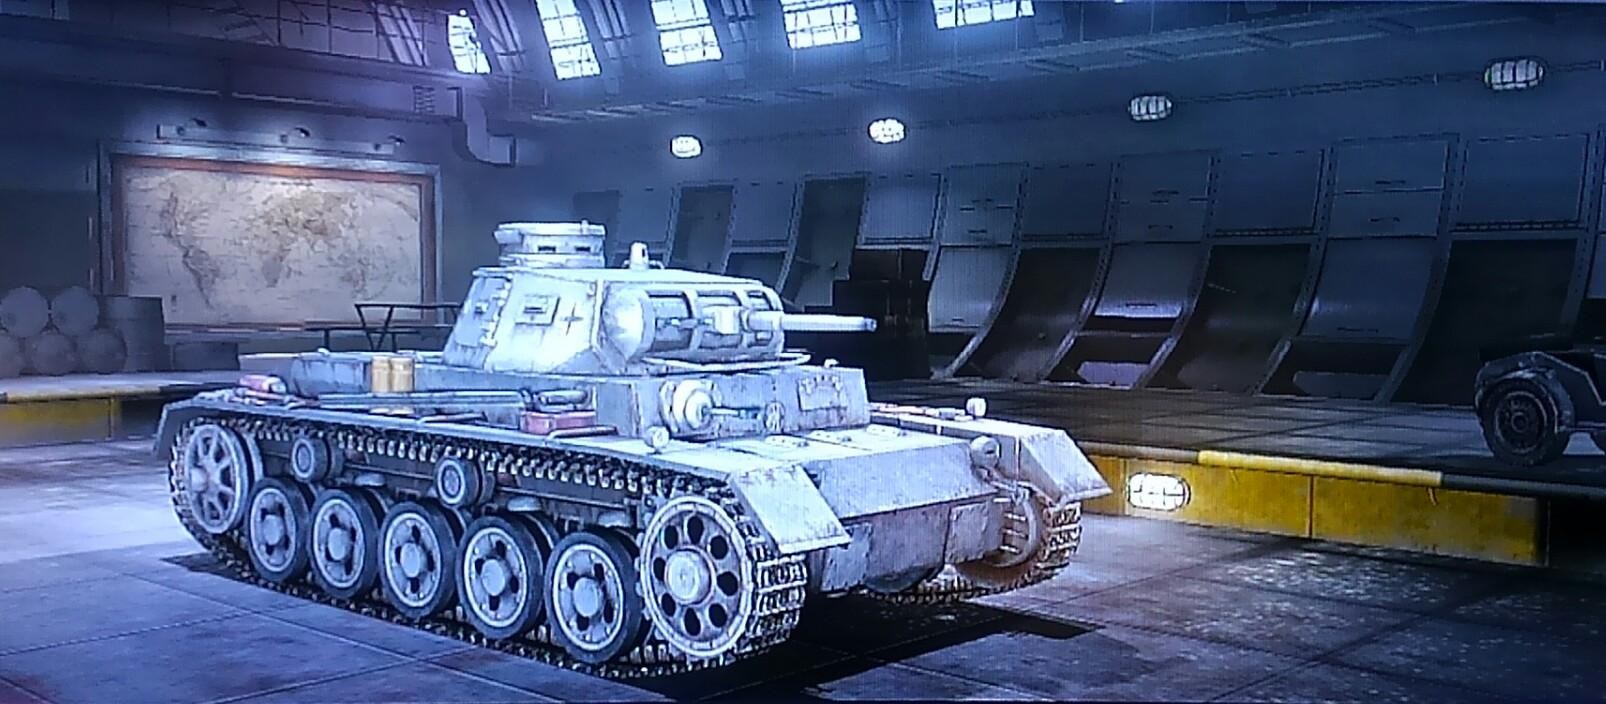 1_Pz.Kpfw._III_Ausf.A.jpg